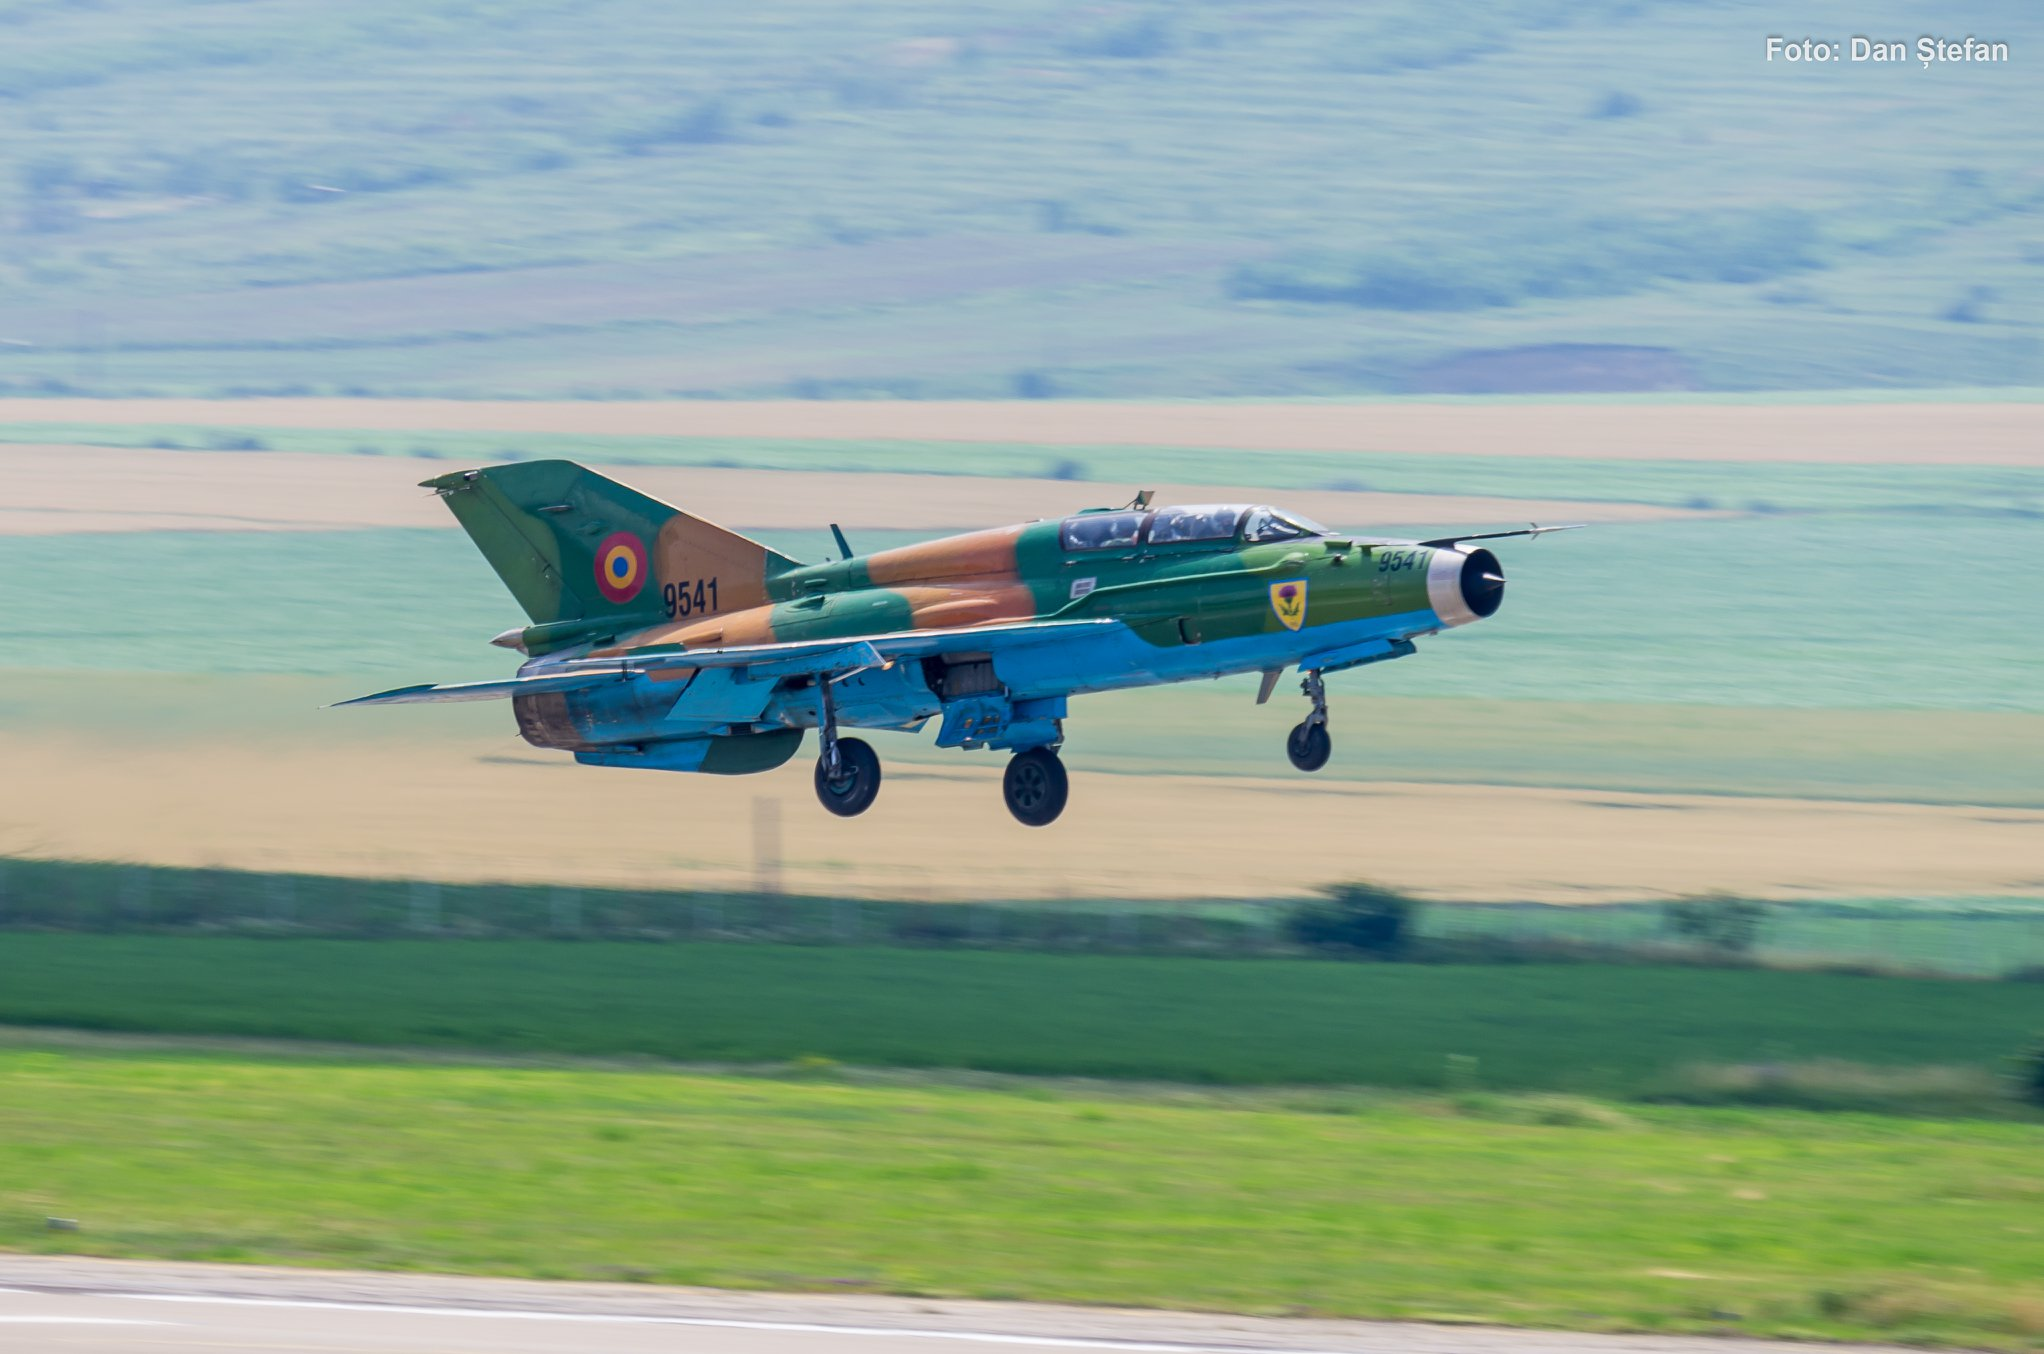 Mikoyan-Gurevich MiG-21 LanceR